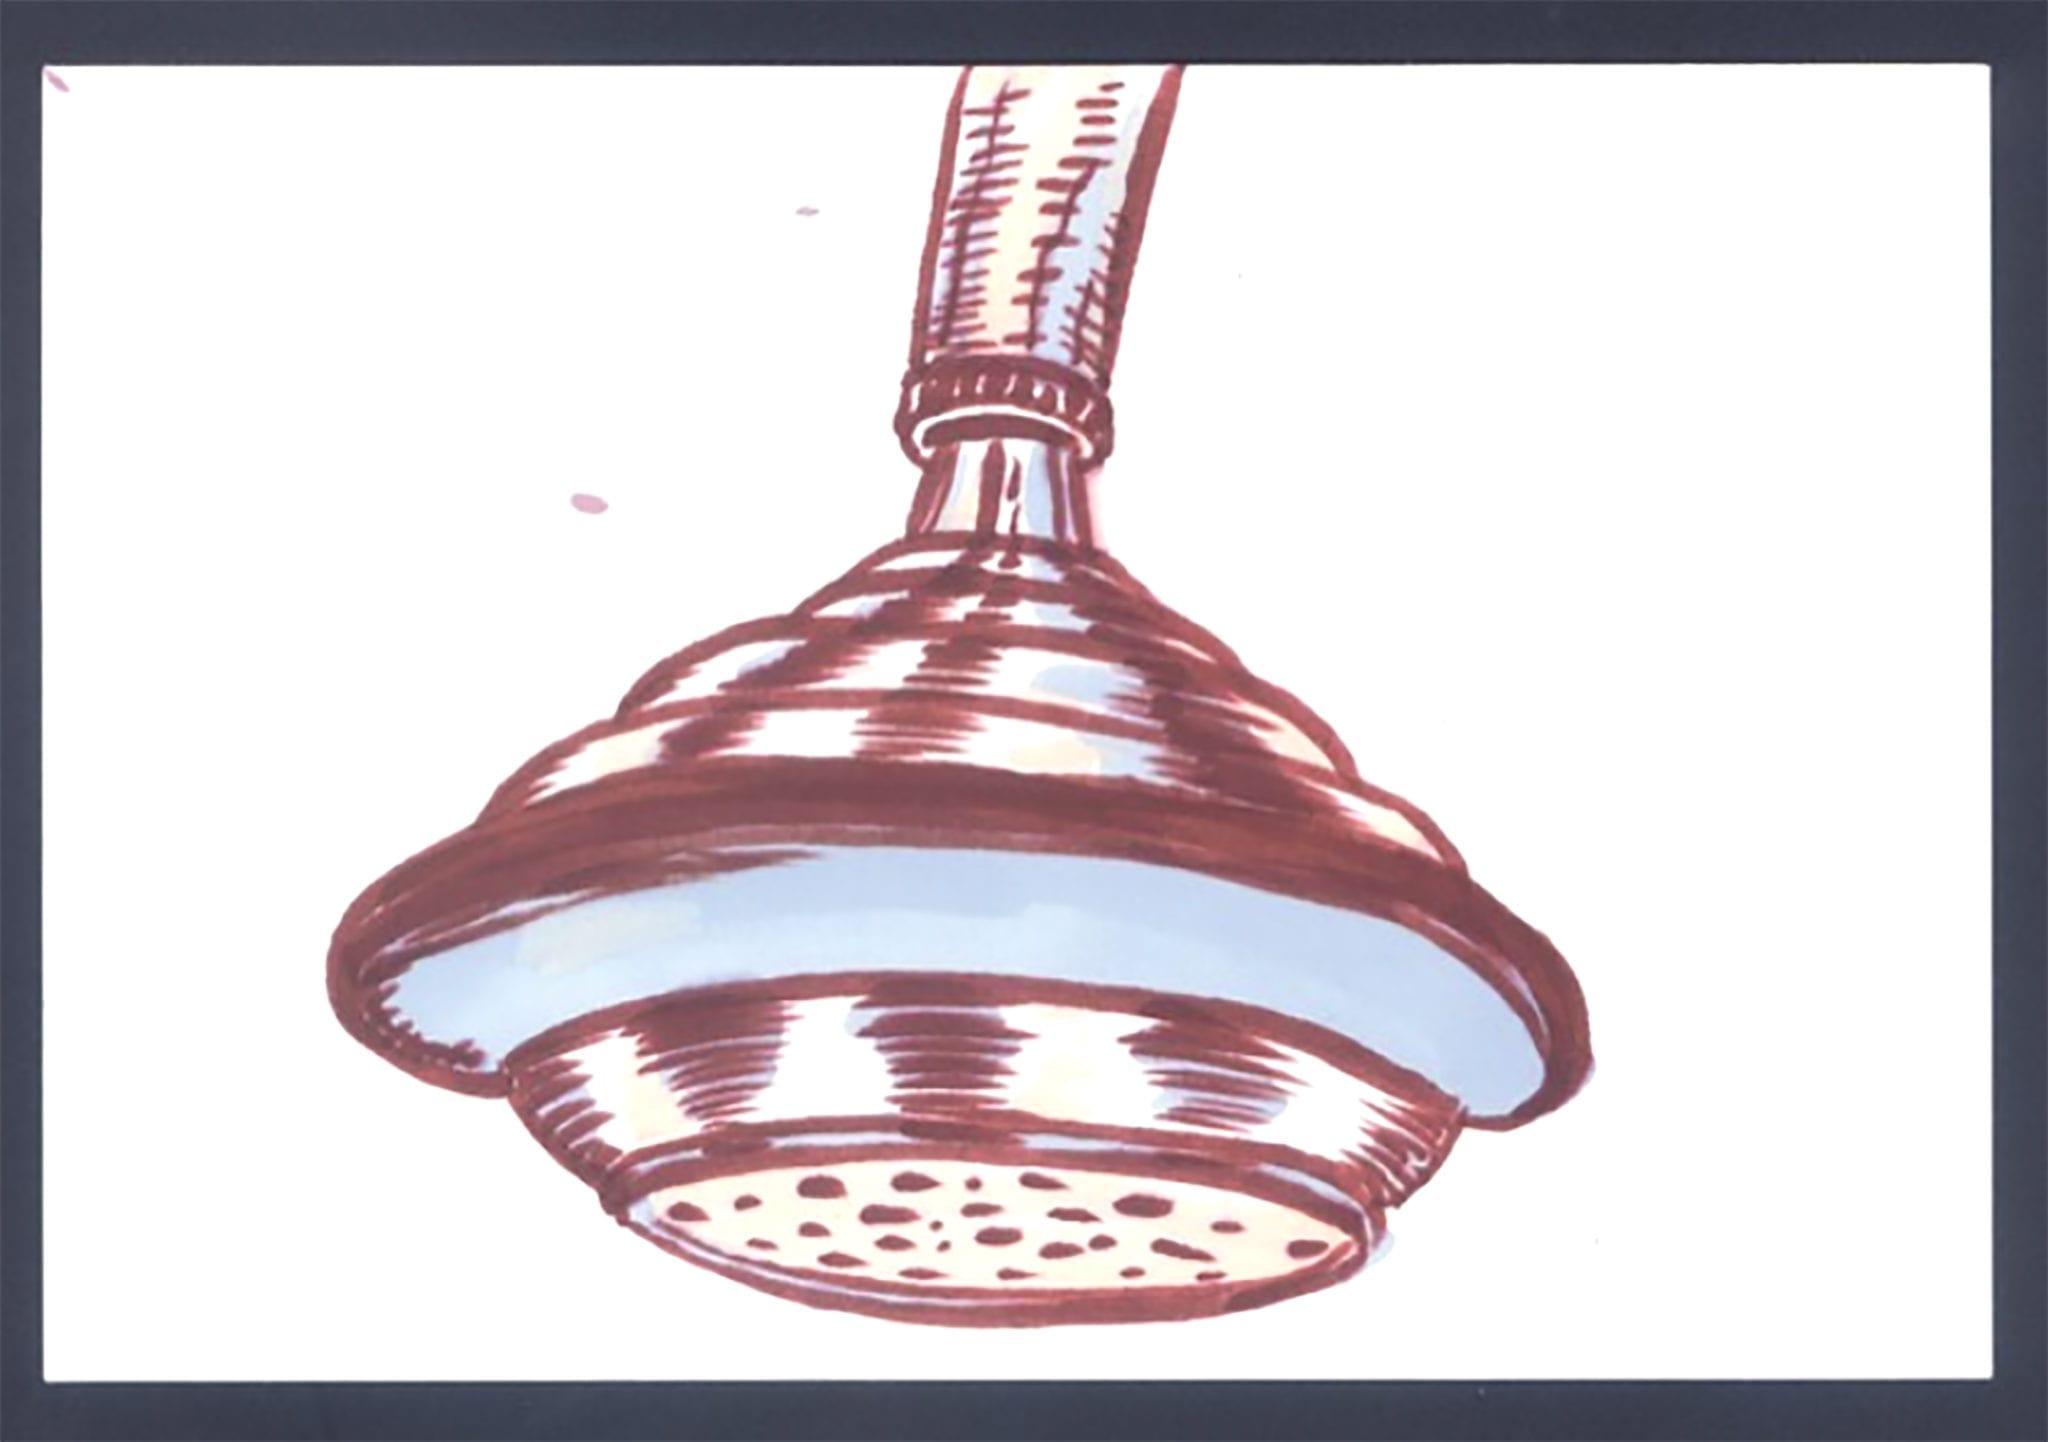 Mark Mothersbaugh artwork Untitled 1996